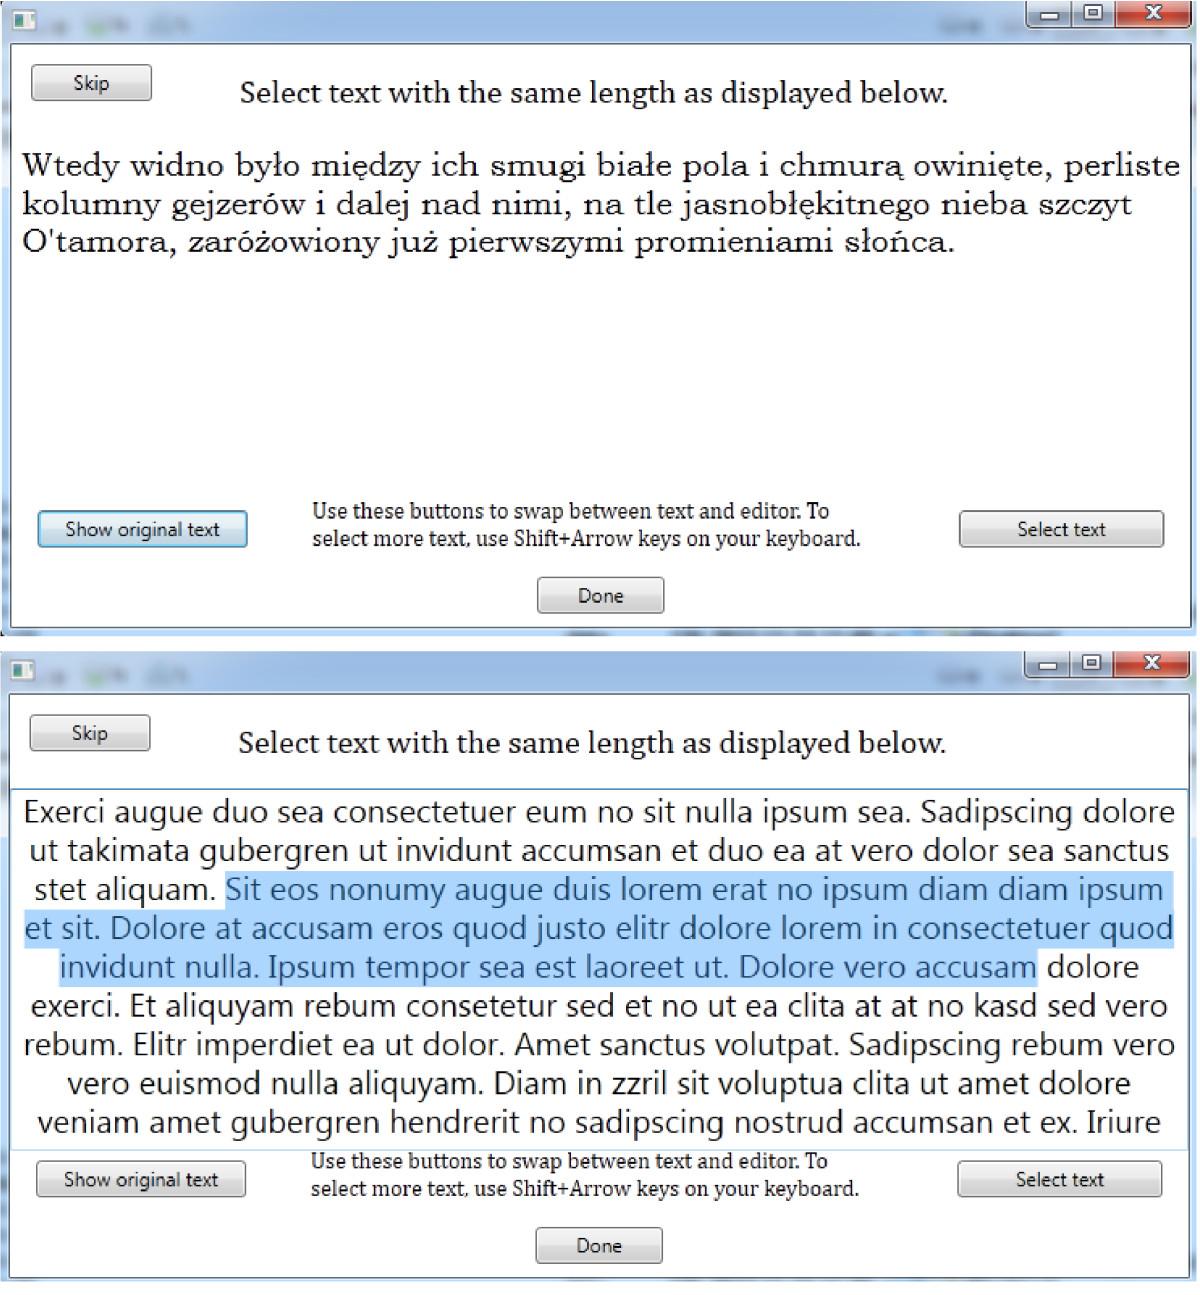 https://static-content.springer.com/image/art%3A10.1140%2Fepjds14/MediaObjects/13688_2012_Article_13_Fig9_HTML.jpg